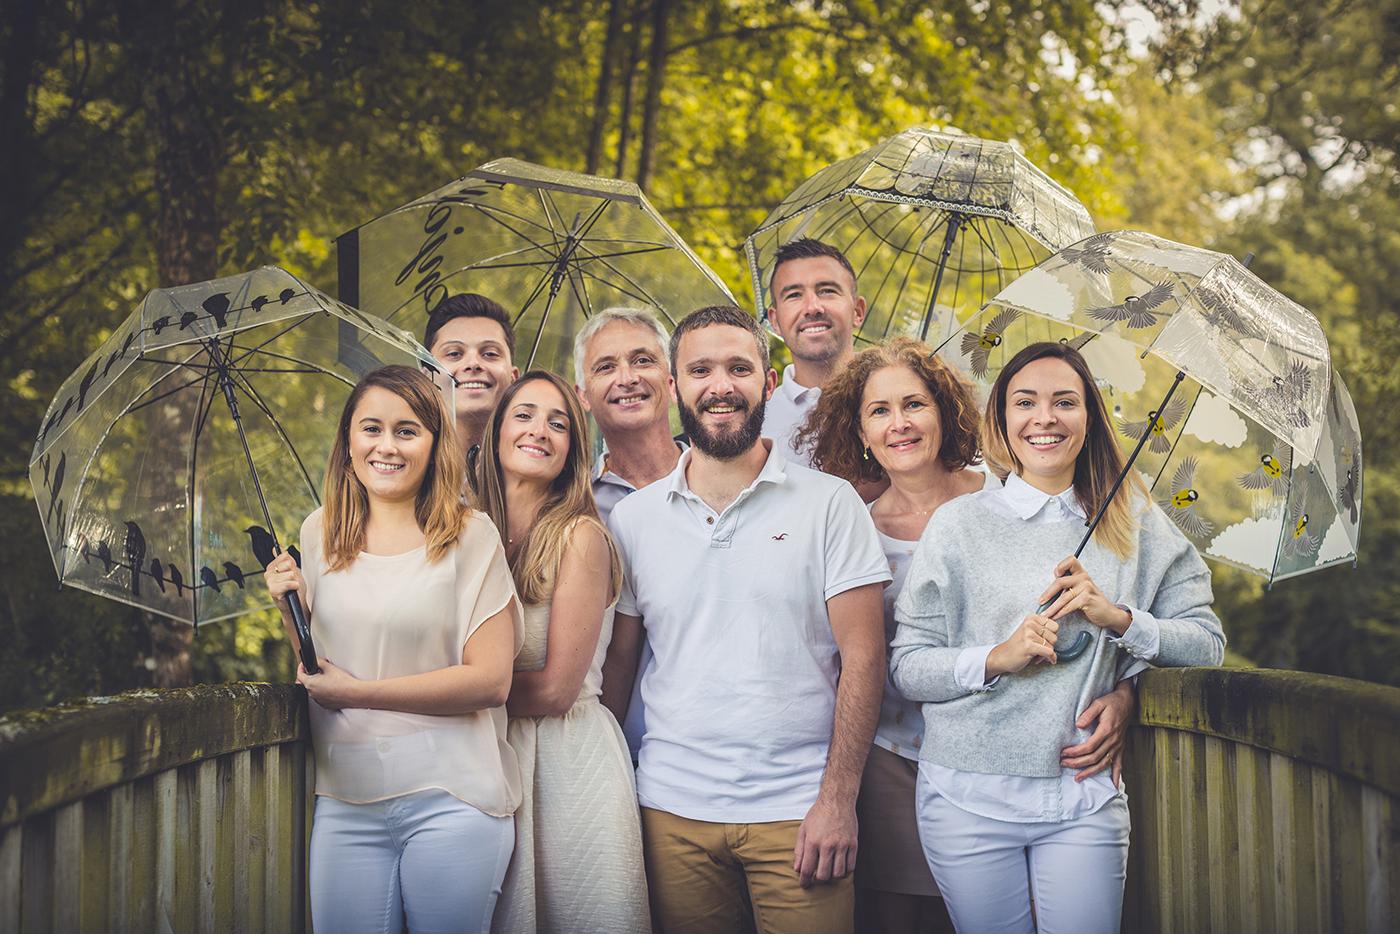 photographe-famille-poitiers-guillaume-heraud-20